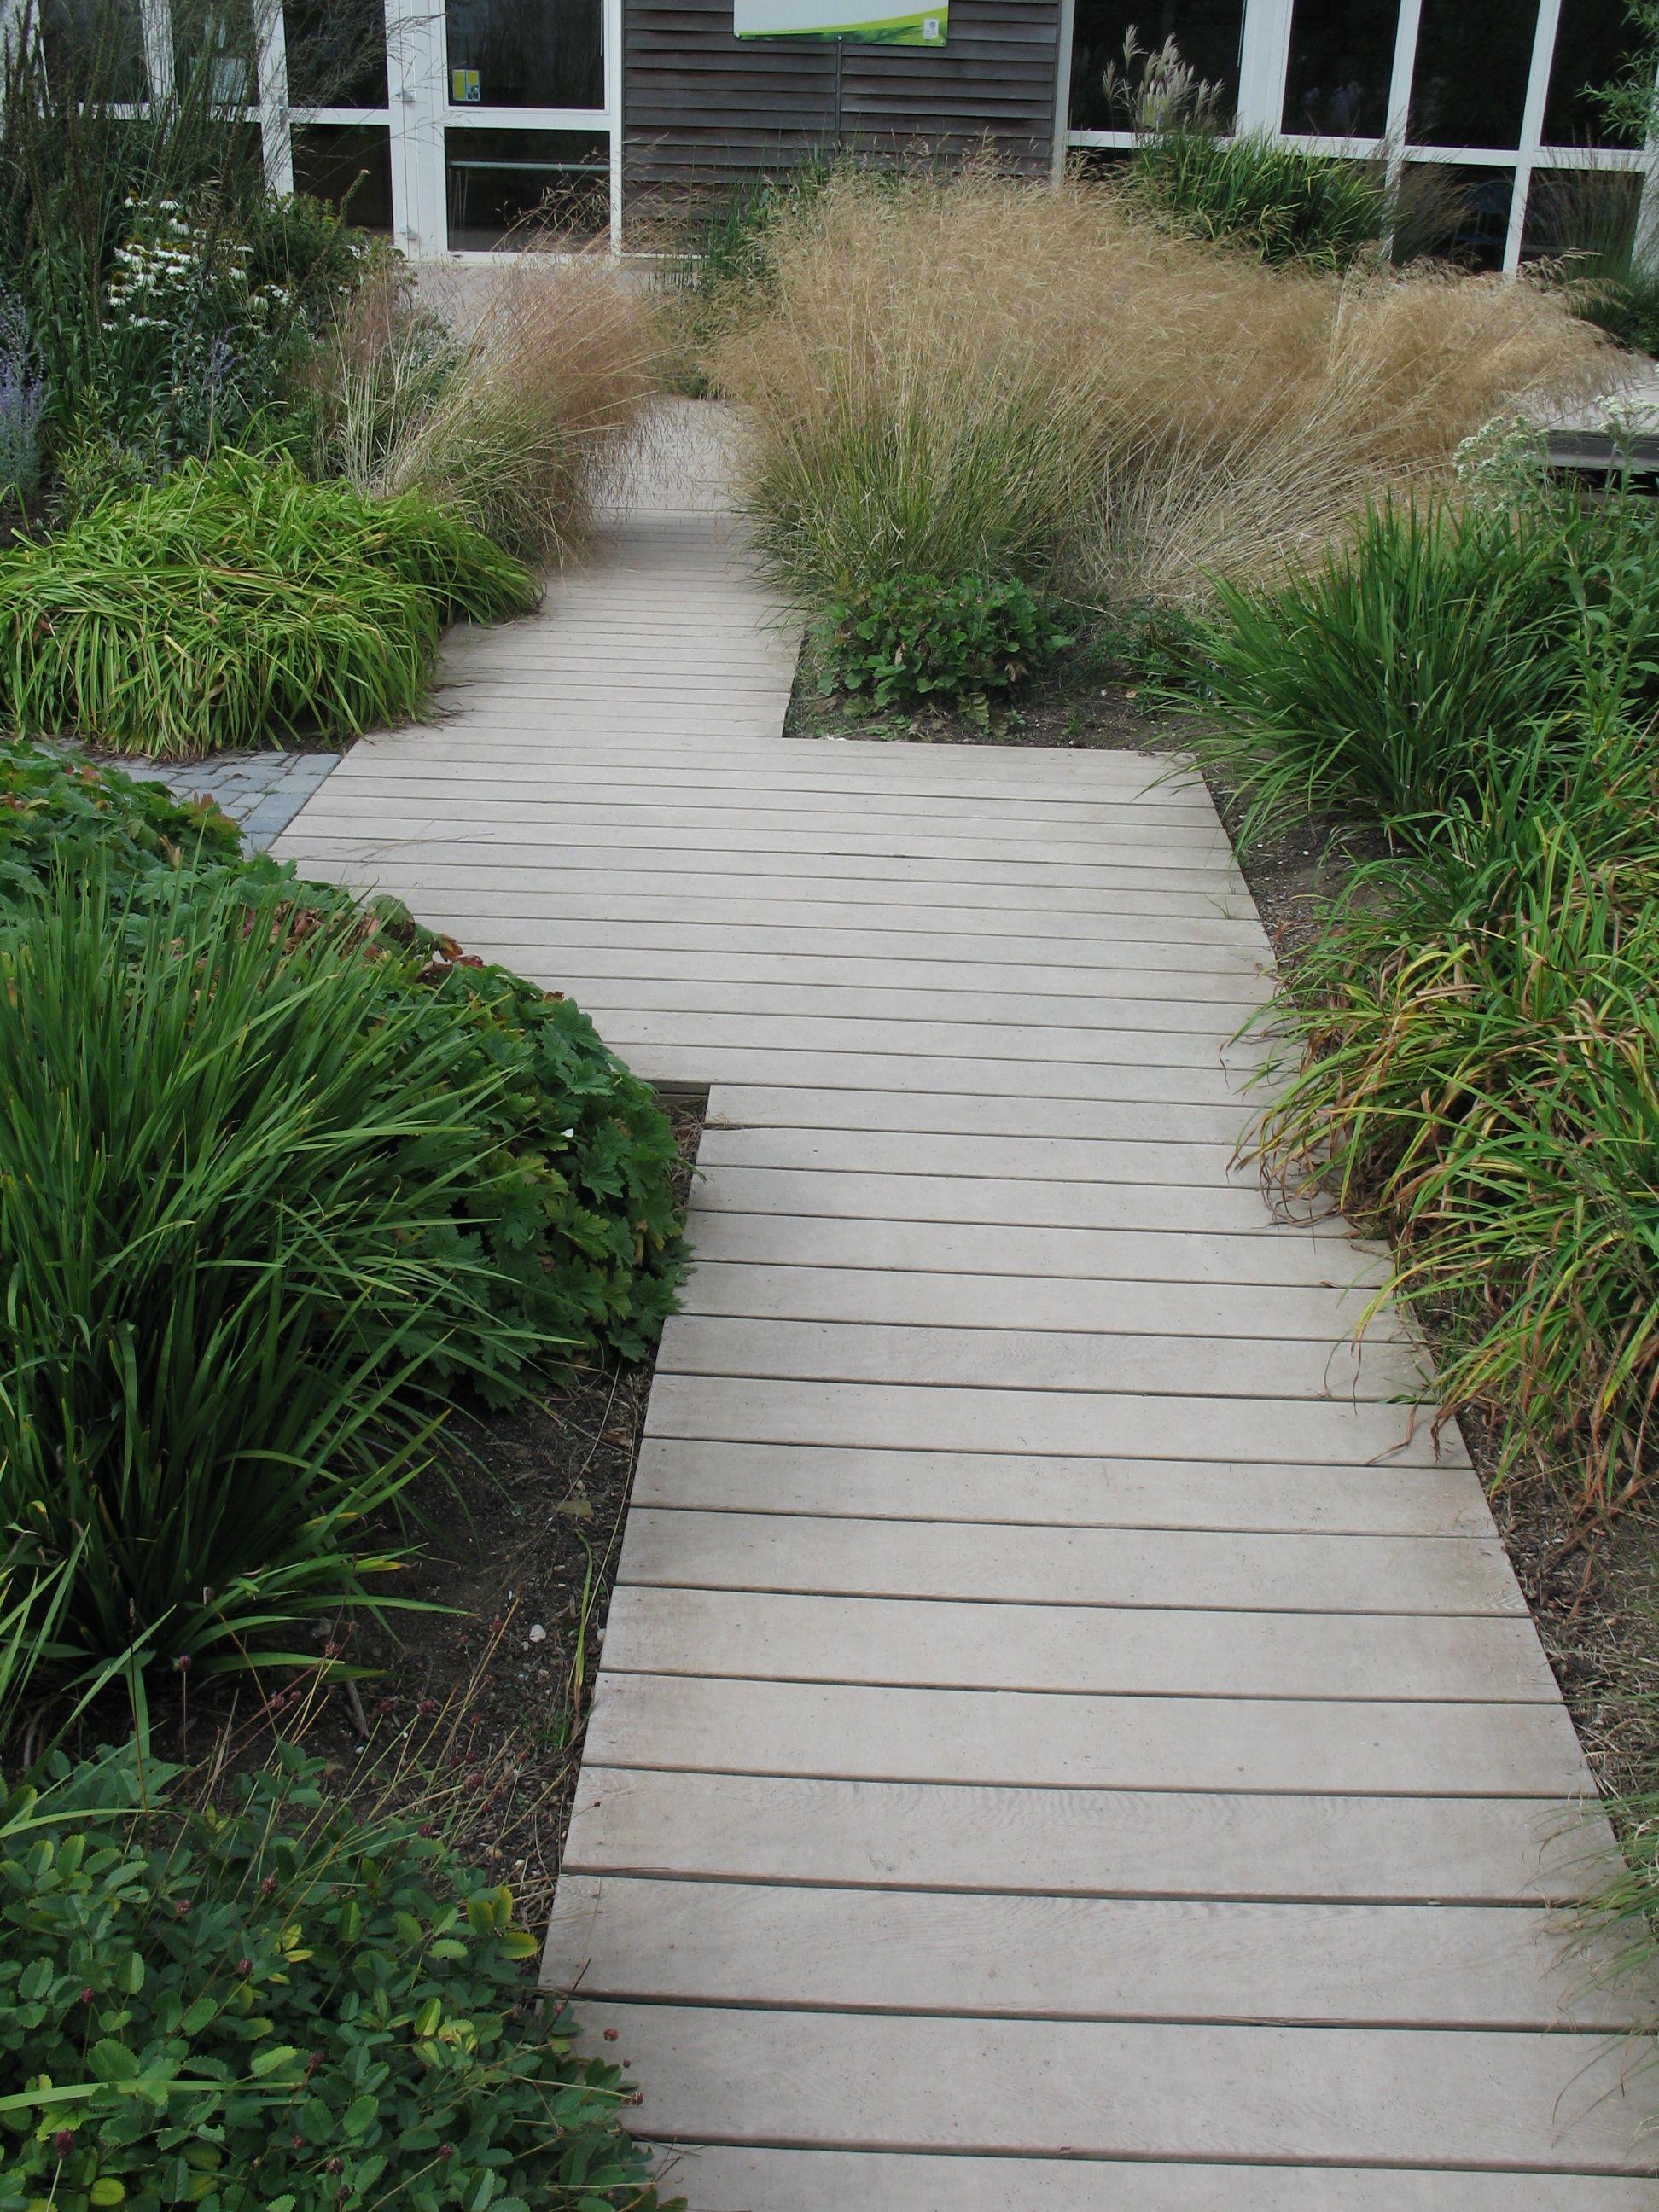 wooden path wisley gardens garden paths walkway garden. Black Bedroom Furniture Sets. Home Design Ideas